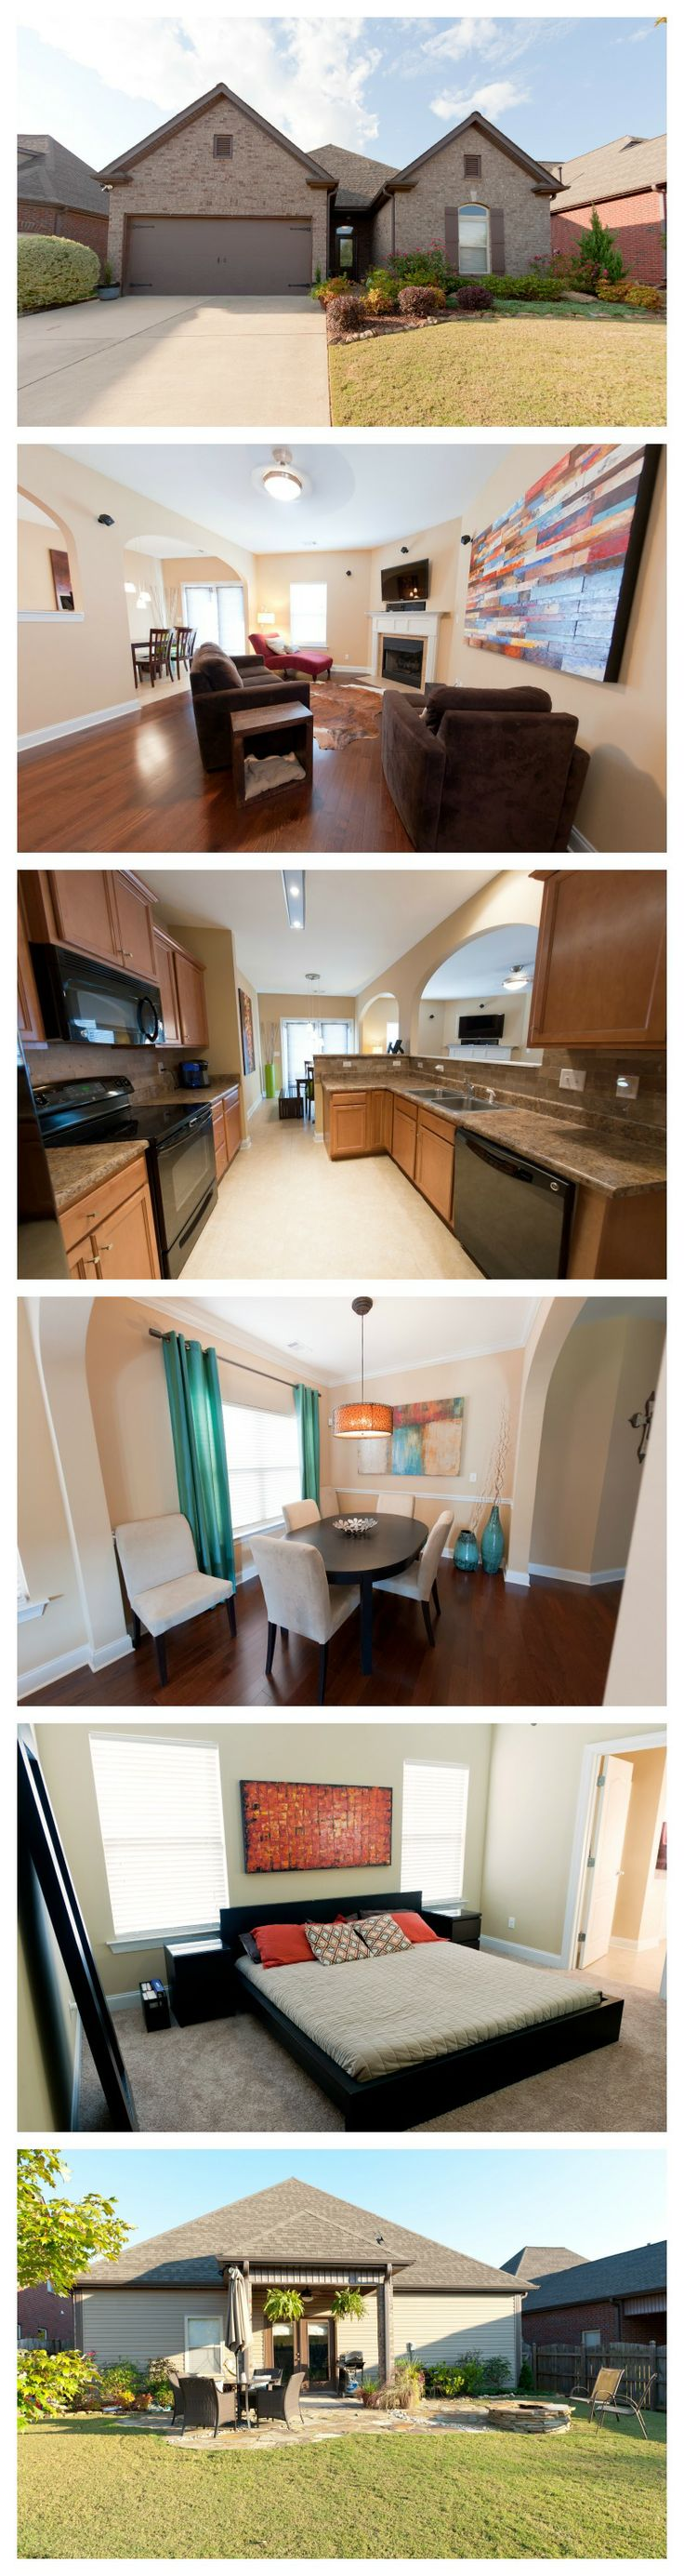 Fabulous 4 bed/ 2 bath home in Glen Cross, Trussville, AL. Click below for more details! #trussville #alabama #trussvilleschools #homeforsale #realestate #KarenBurnsTeam http://www.trulia.com/property/1074593143-156-Glen-Cross-Cir-Trussville-AL-35173